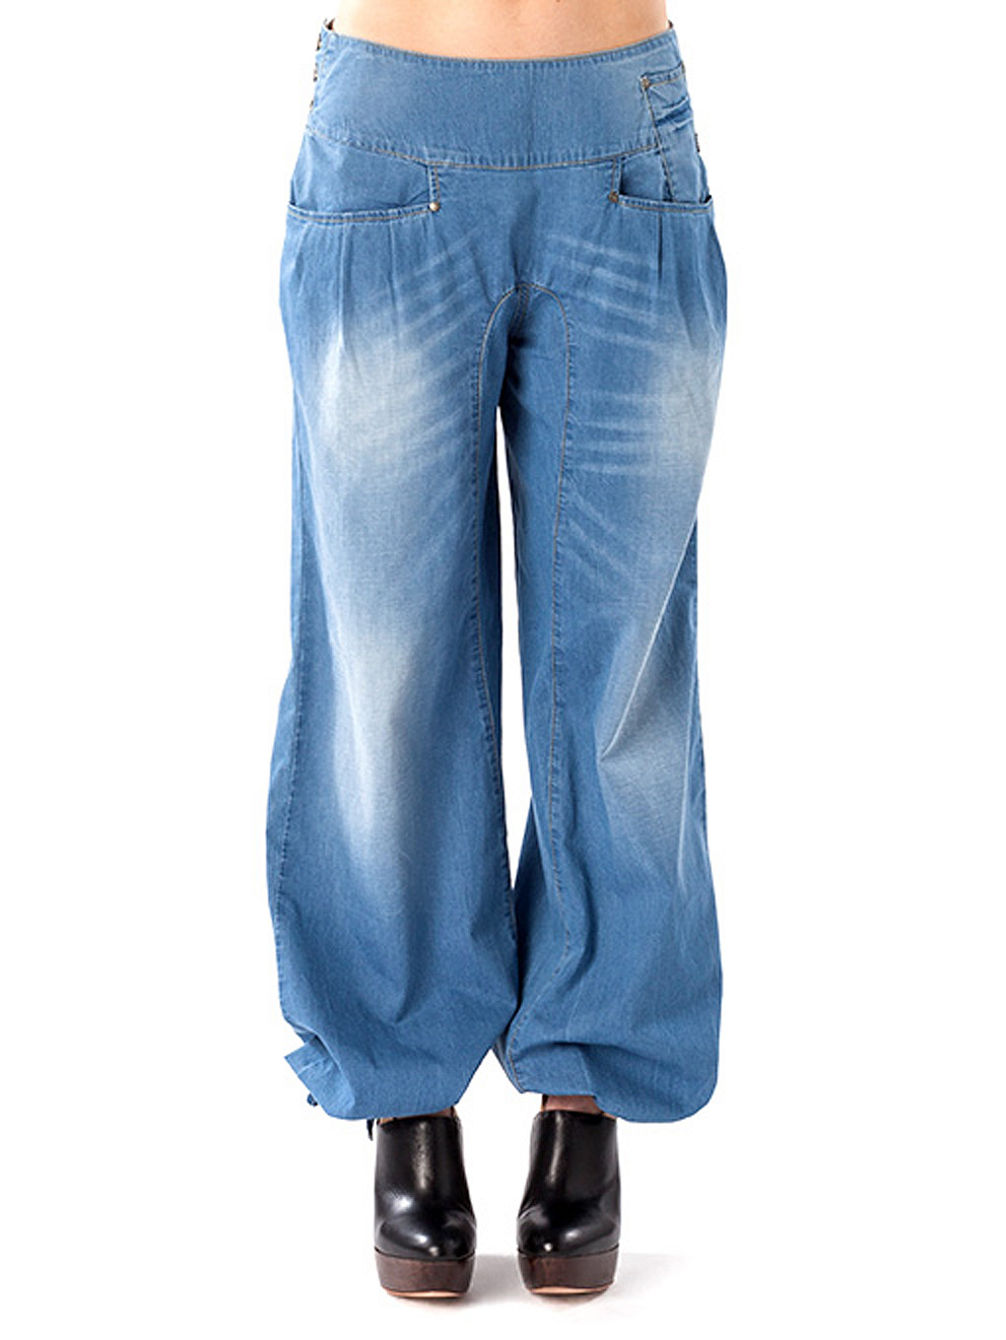 03a42b0f12e9 Nikita Bluebird Jeans online kaufen bei blue-tomato.com